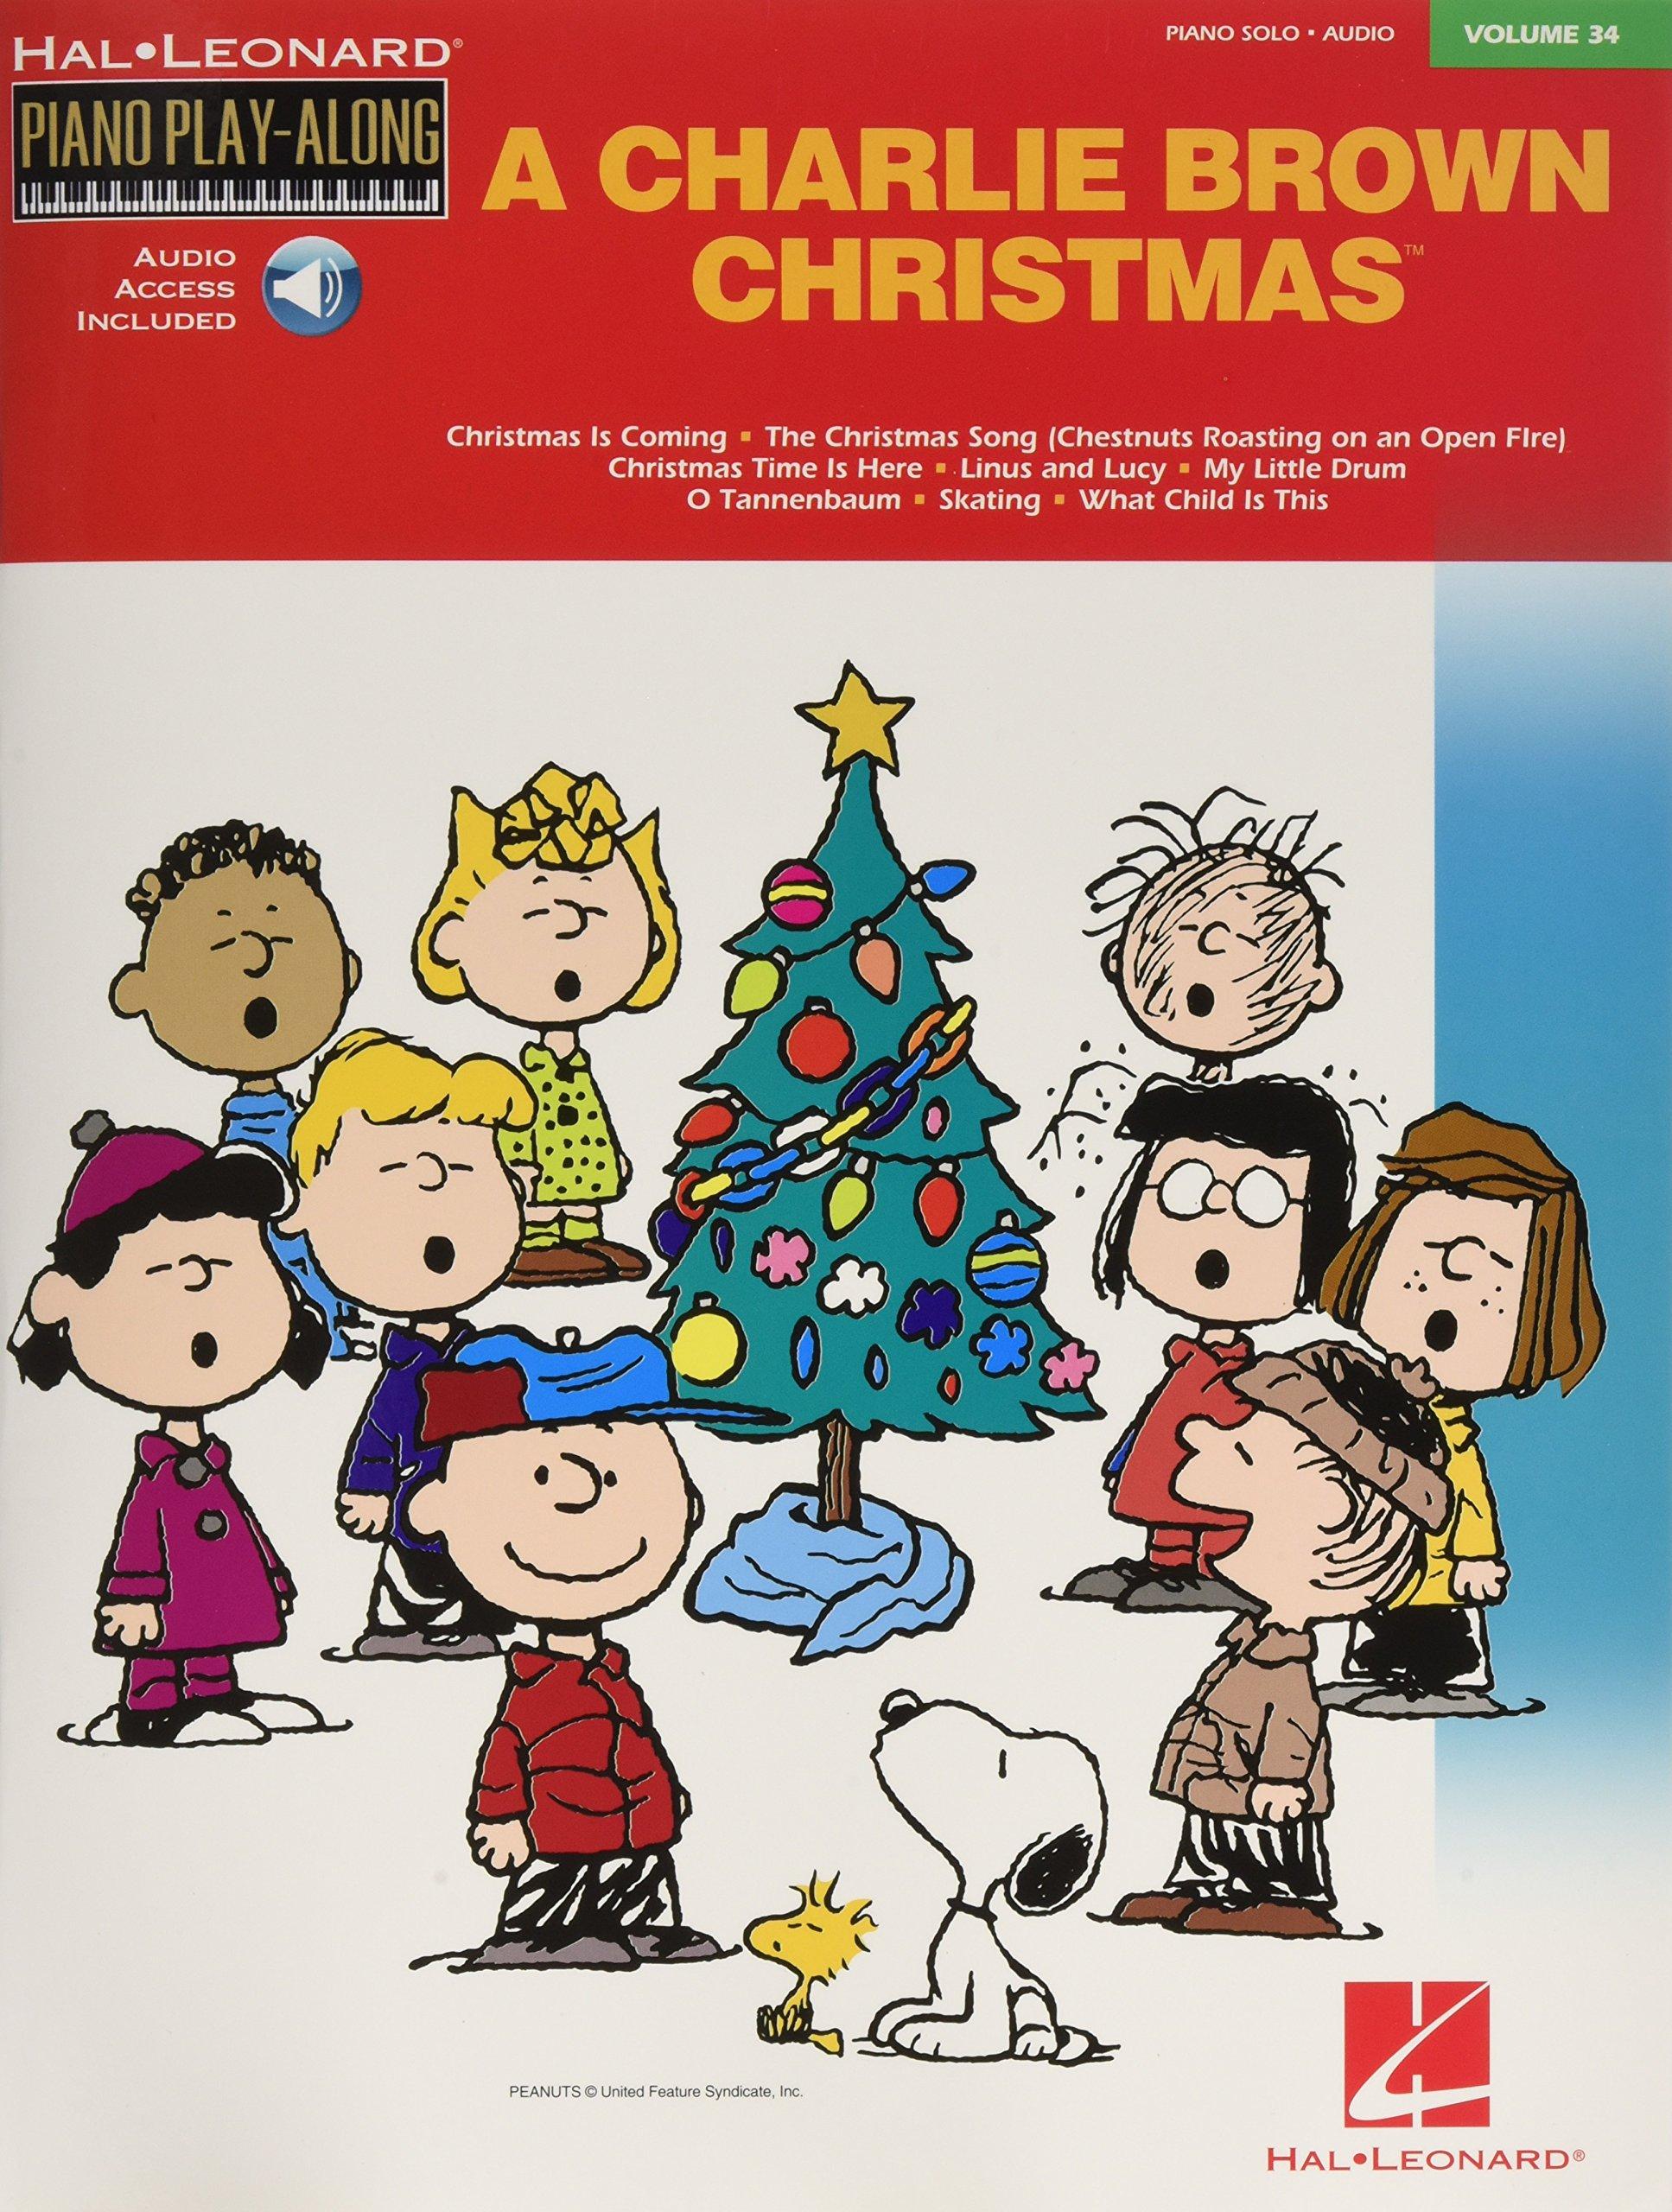 charlie brown christmas piano play along volume 34 hal leonard piano play along vince guaraldi 0073999720174 amazoncom books - What Is Open On Christmas Eve